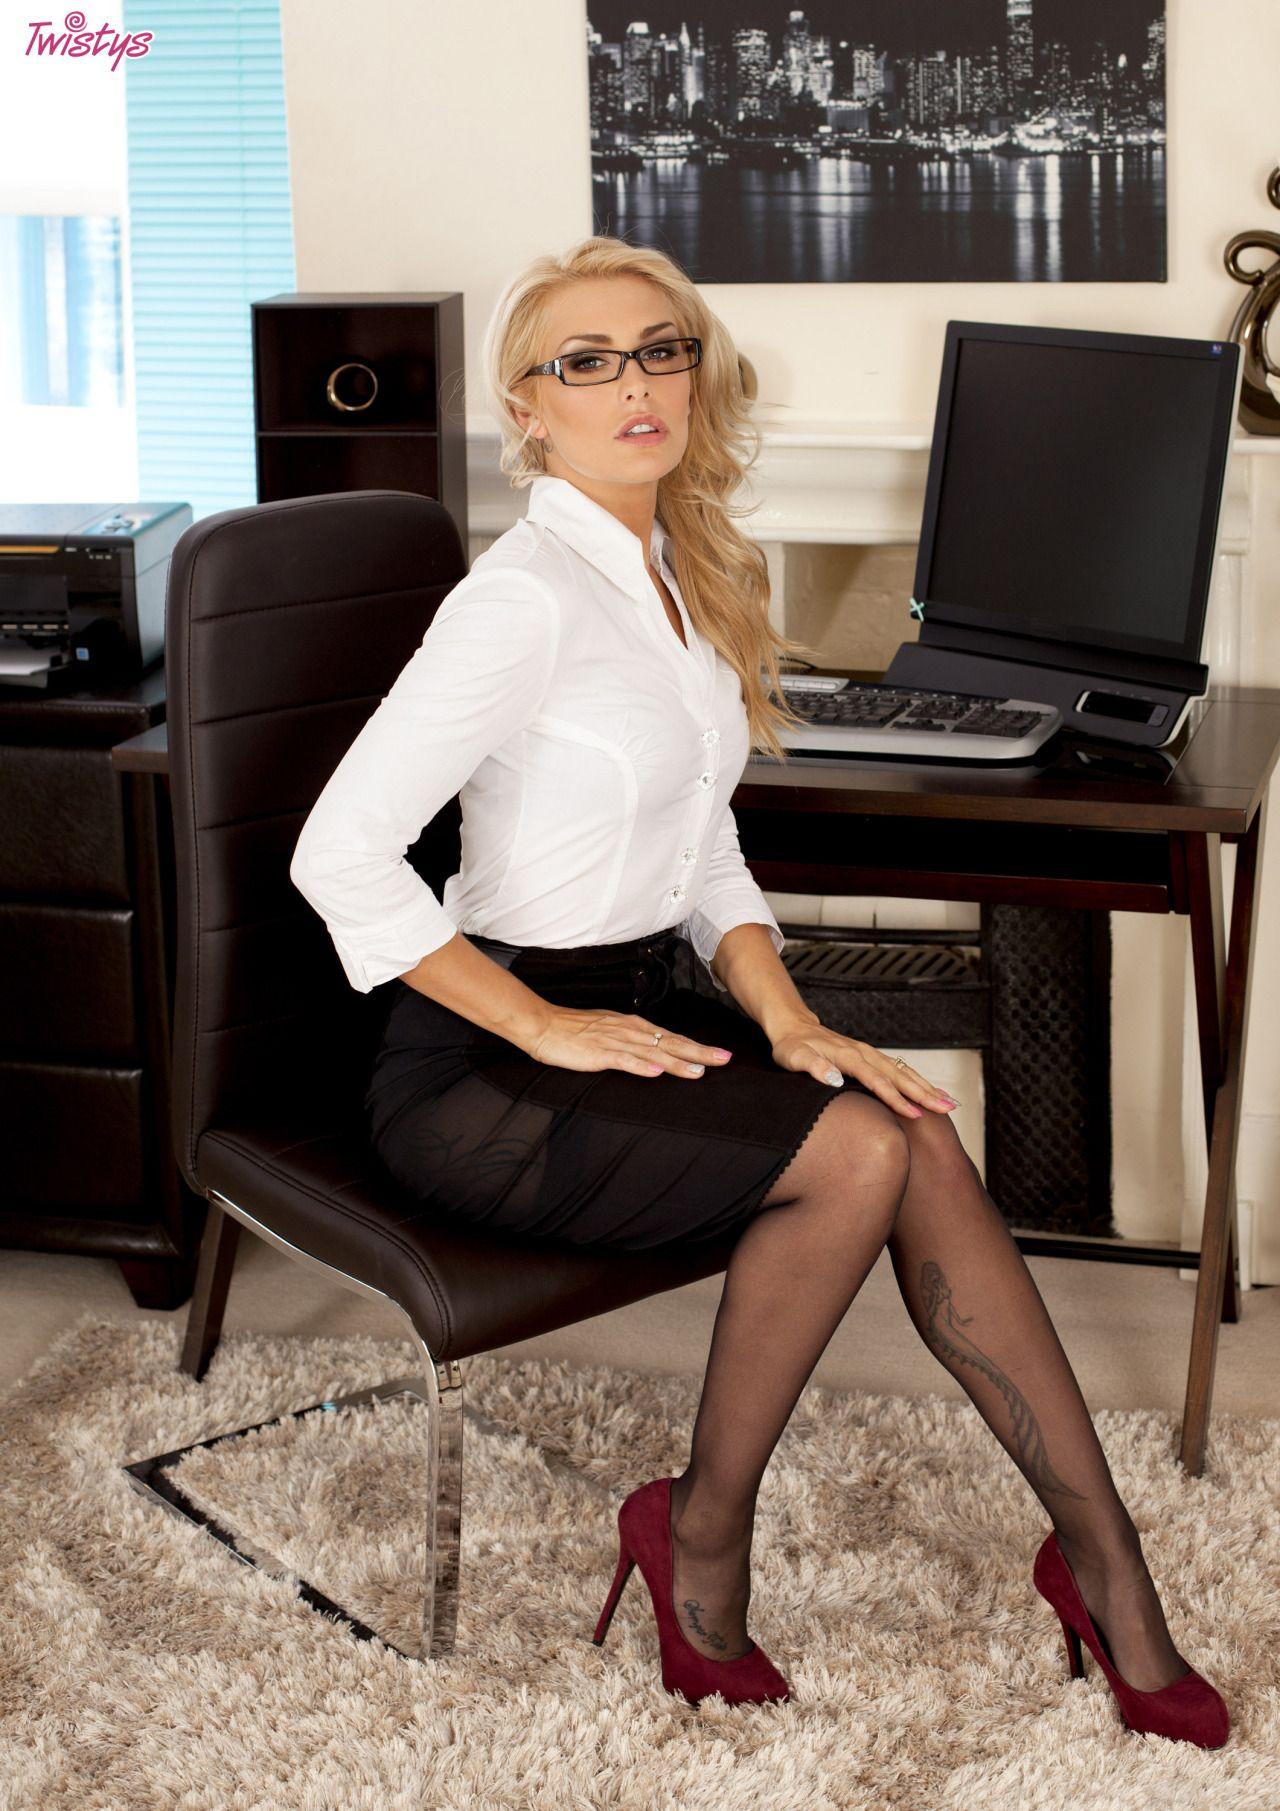 Cuban kakey and secretary office | Sex pics)